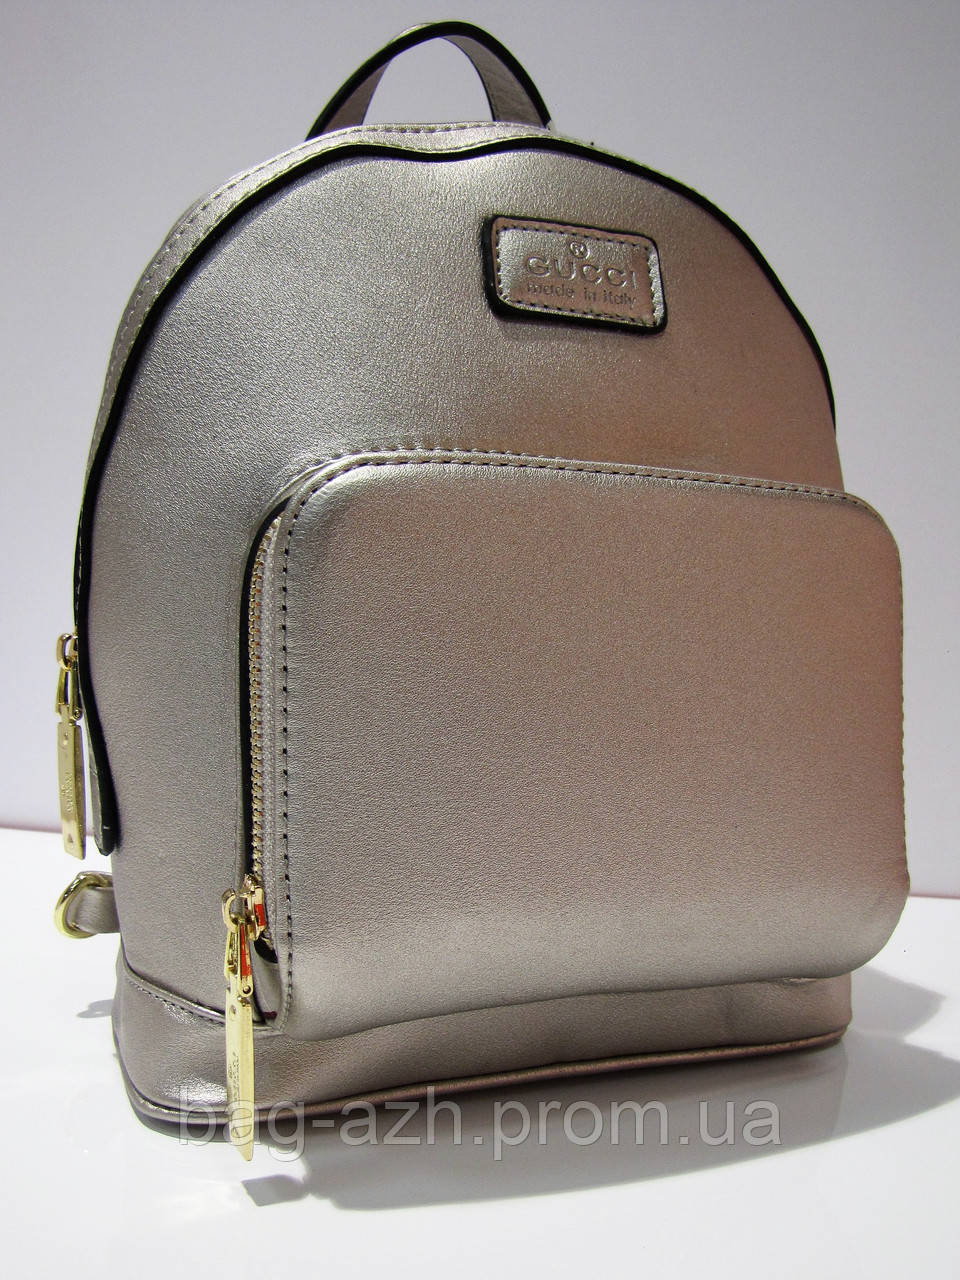 Рюкзак Gucci silver